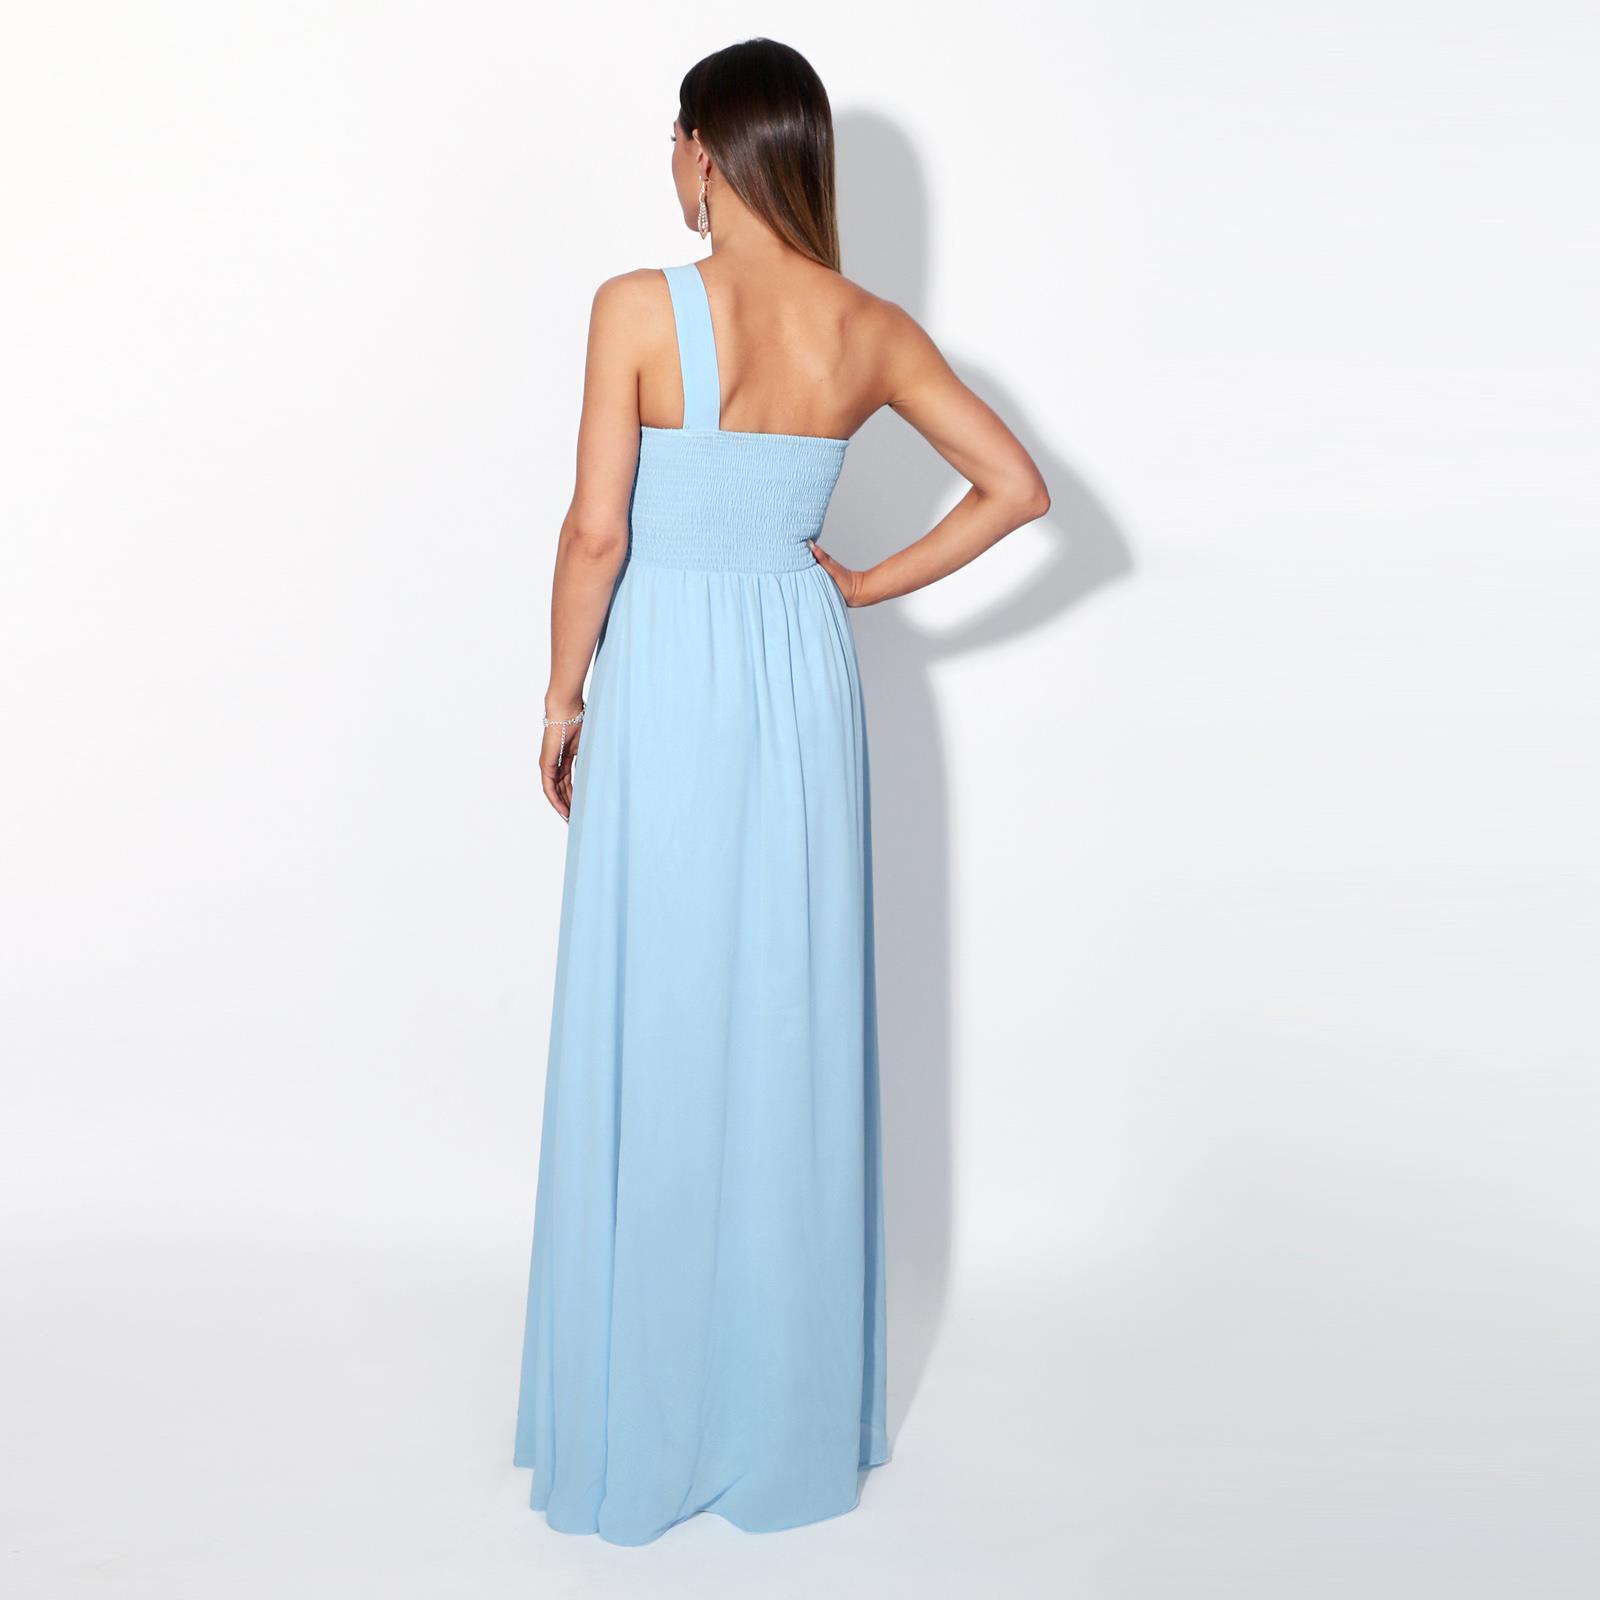 Womens-Wedding-Bridesmaid-Prom-Dress-Formal-One-Off-Shoulder-Long-Evening-8-18 thumbnail 5